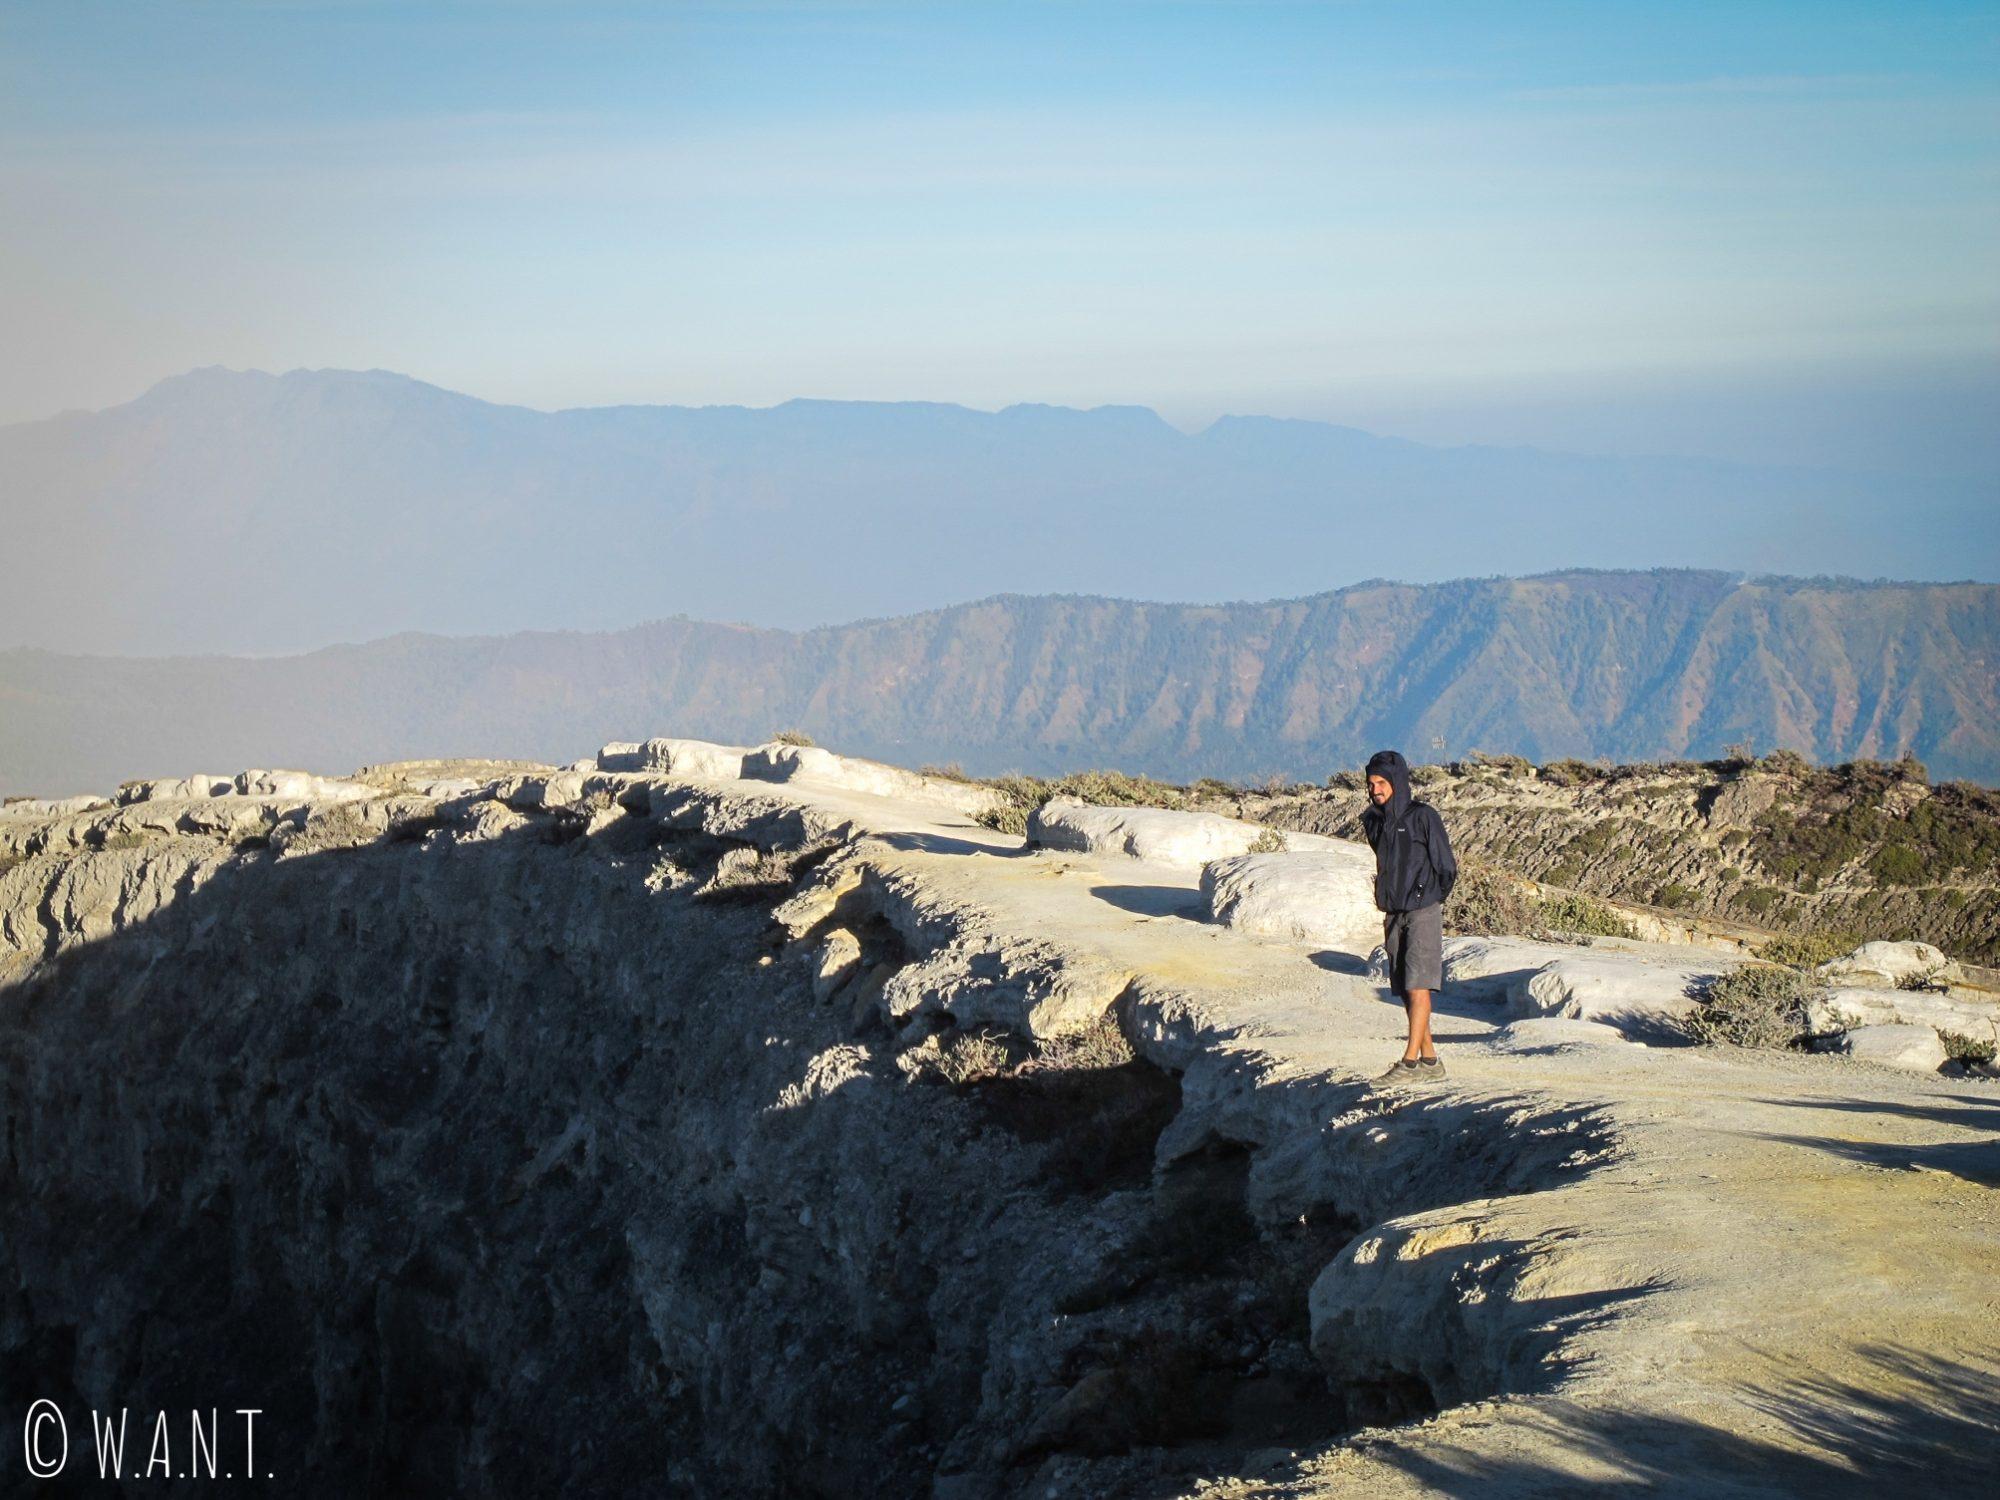 Benjamin au bord du cratère du Kawah Ijen